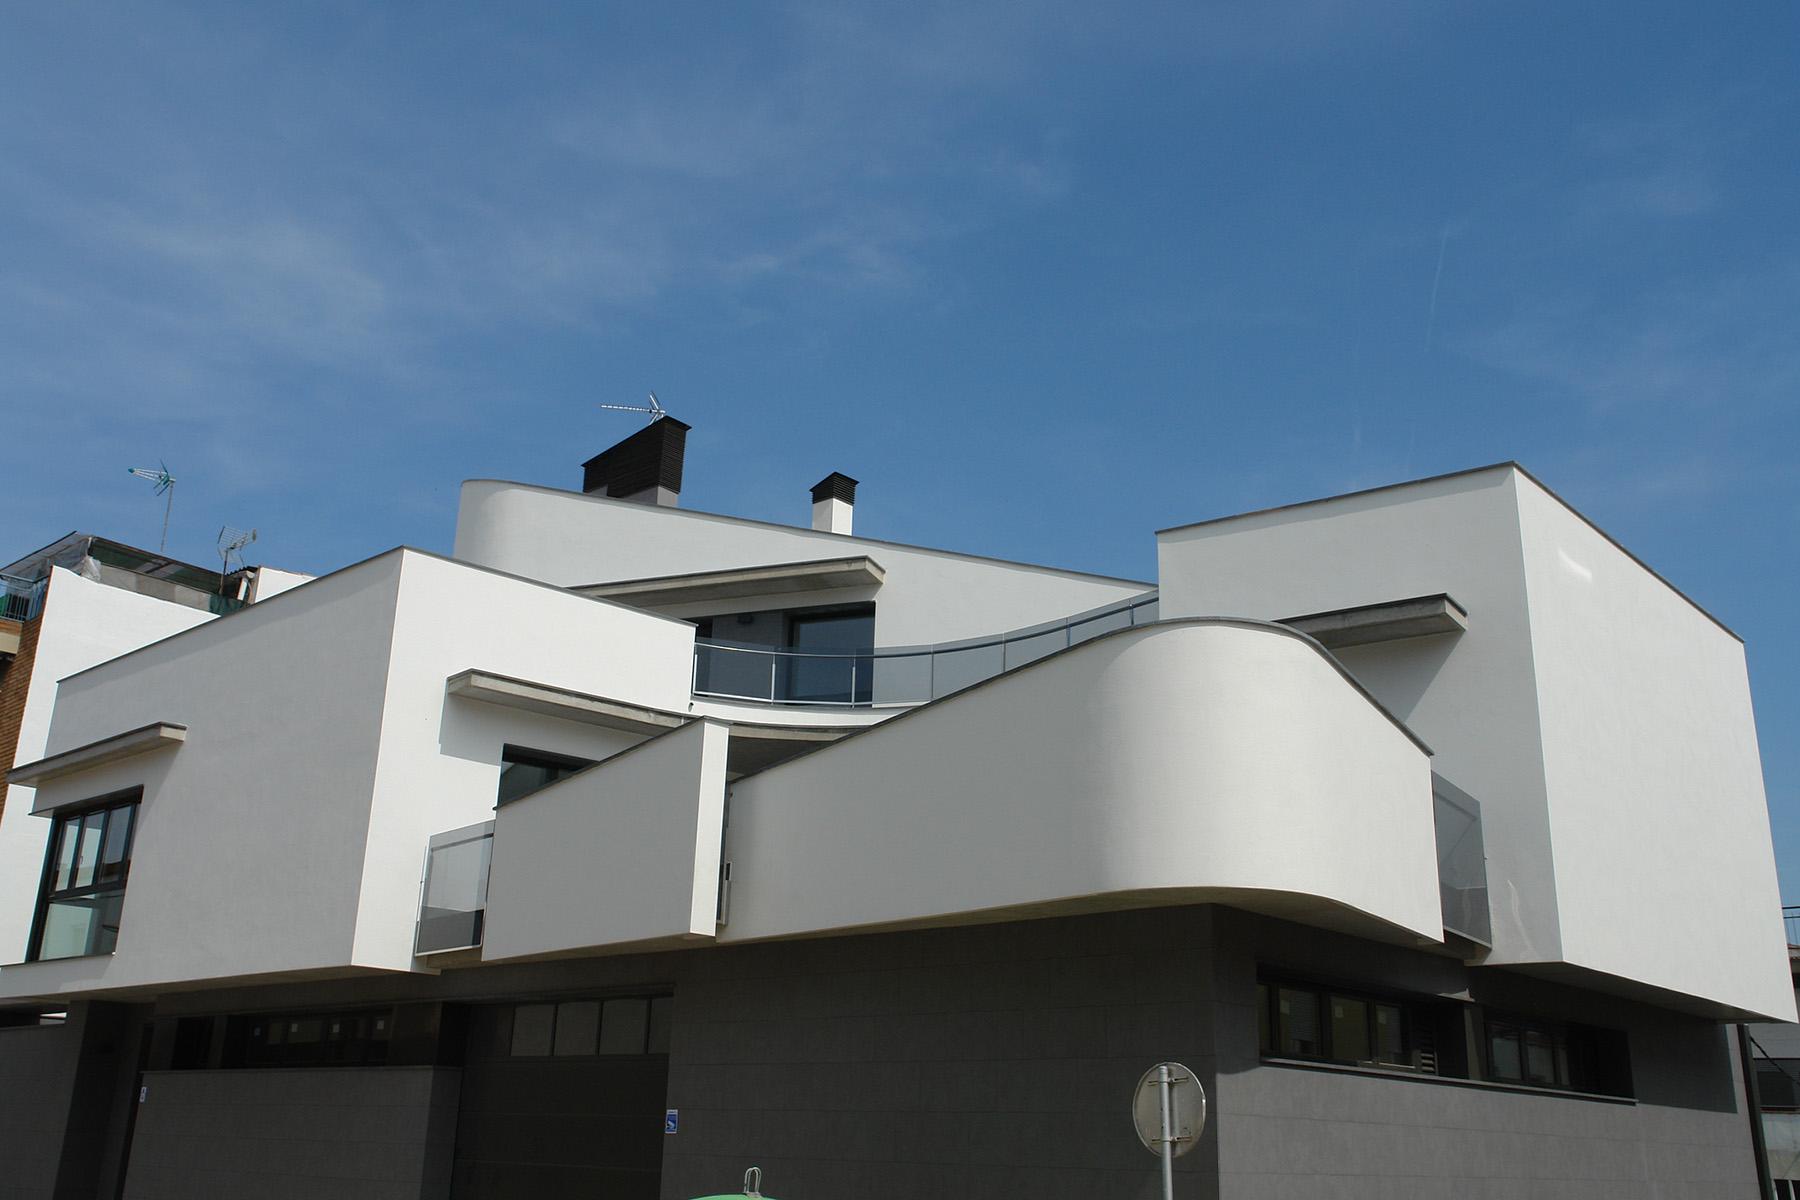 Galeria Casa en Binéfar, Huesca - 5 ?>